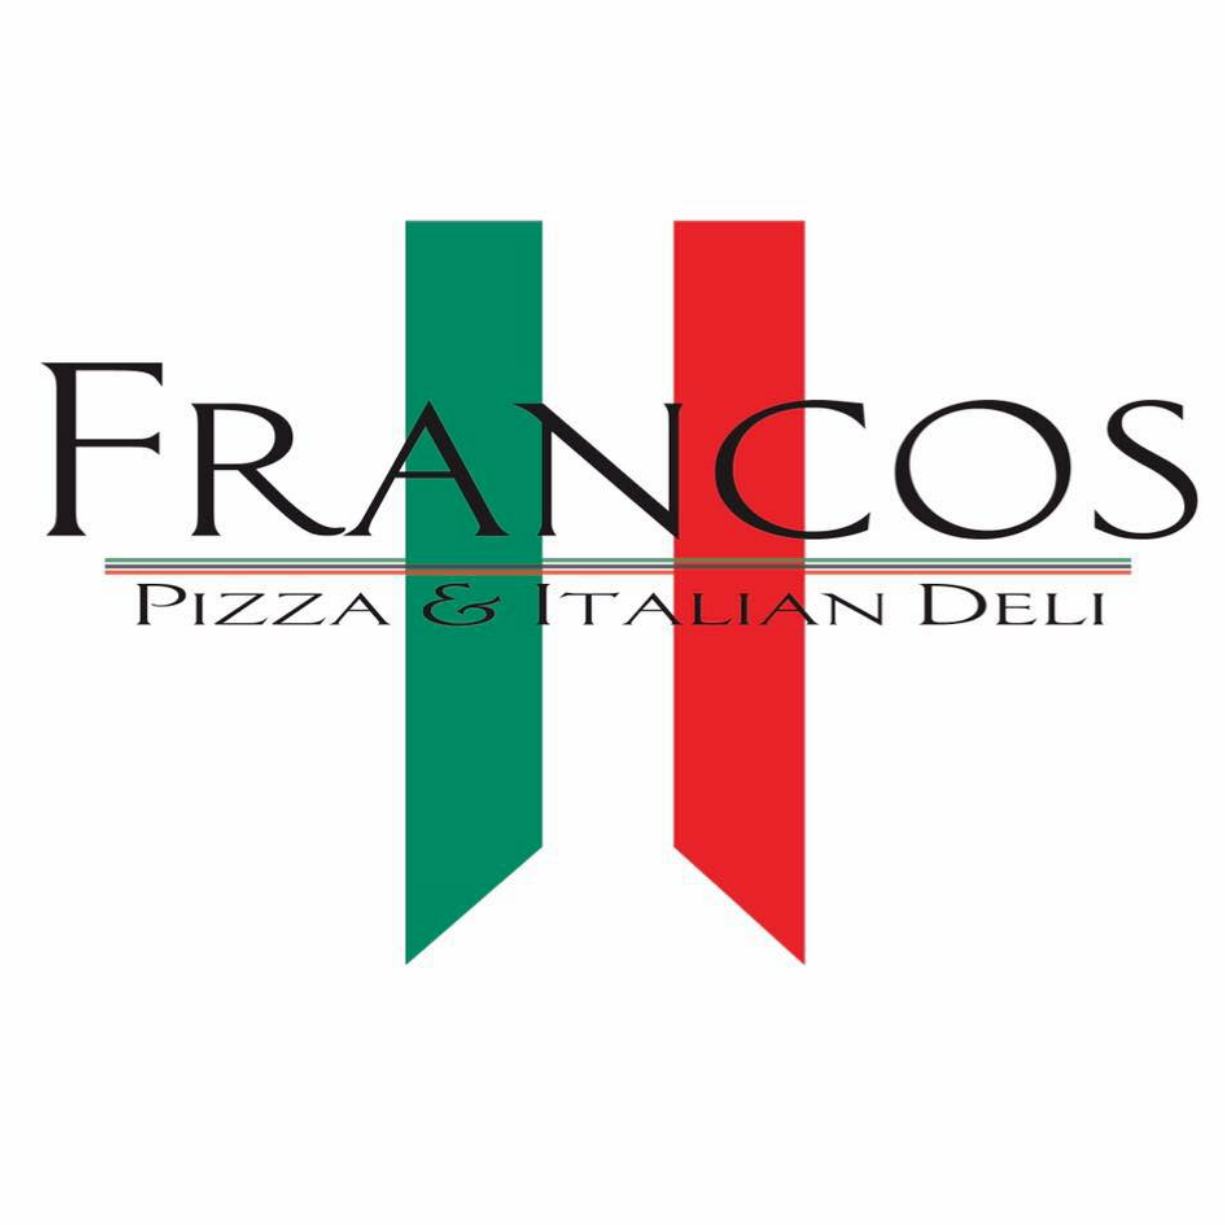 Franco's Pizza & Italian Deli